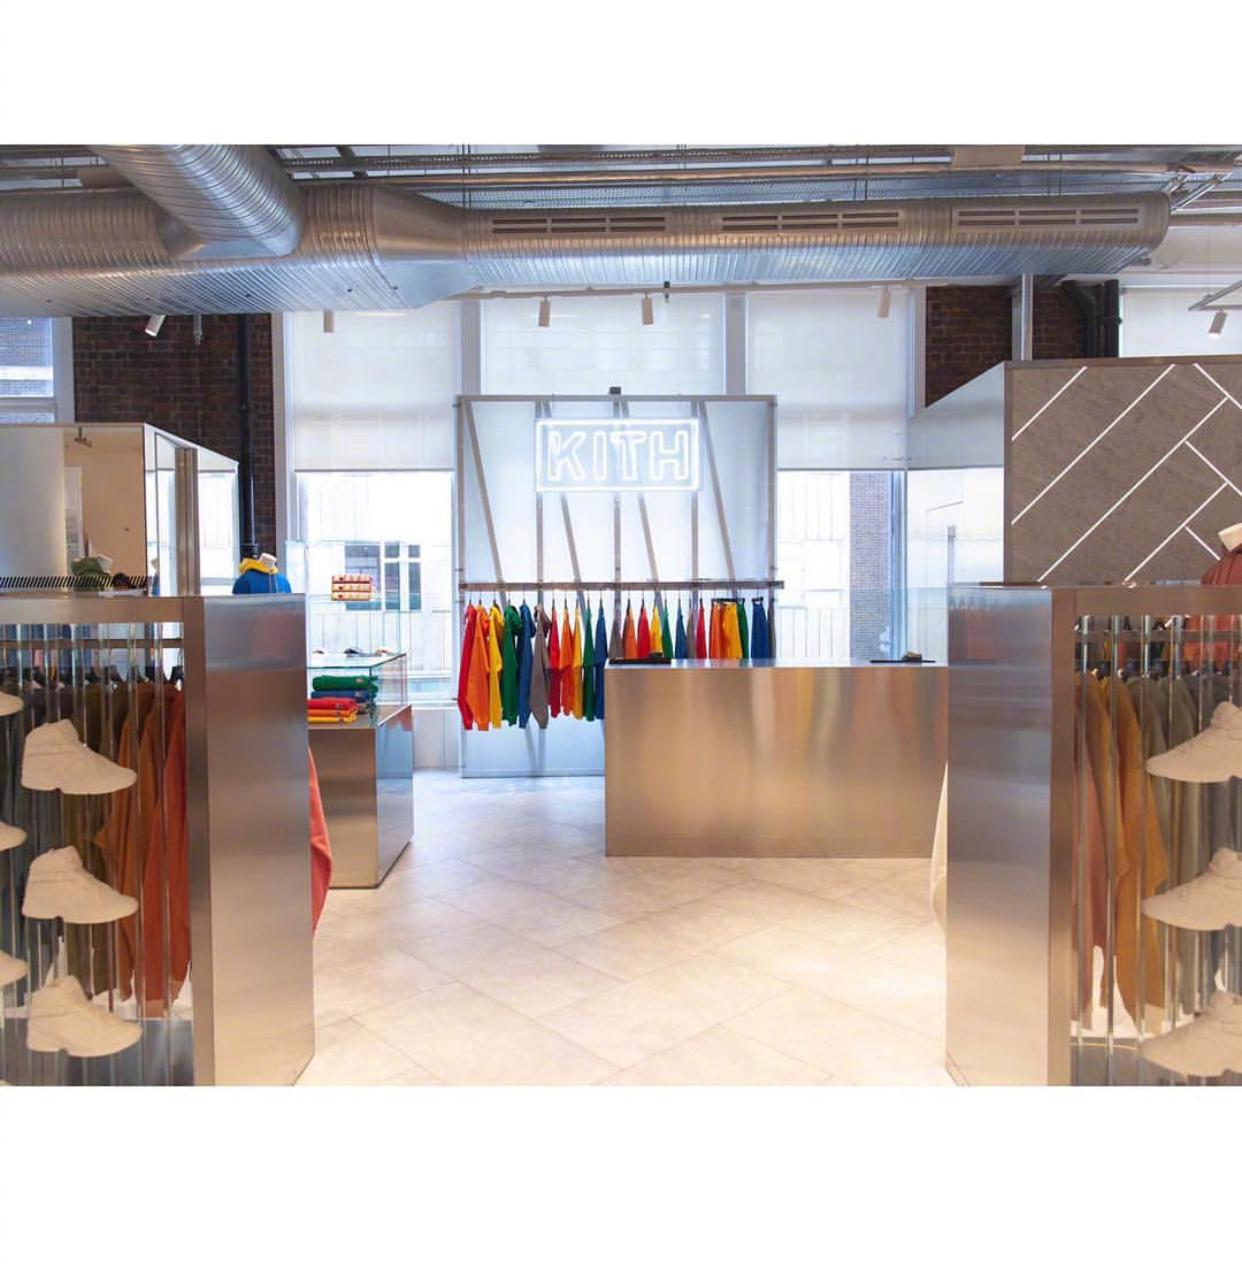 Kith 在伦敦Selfridges的新店正式开业~ 还没去过伦敦